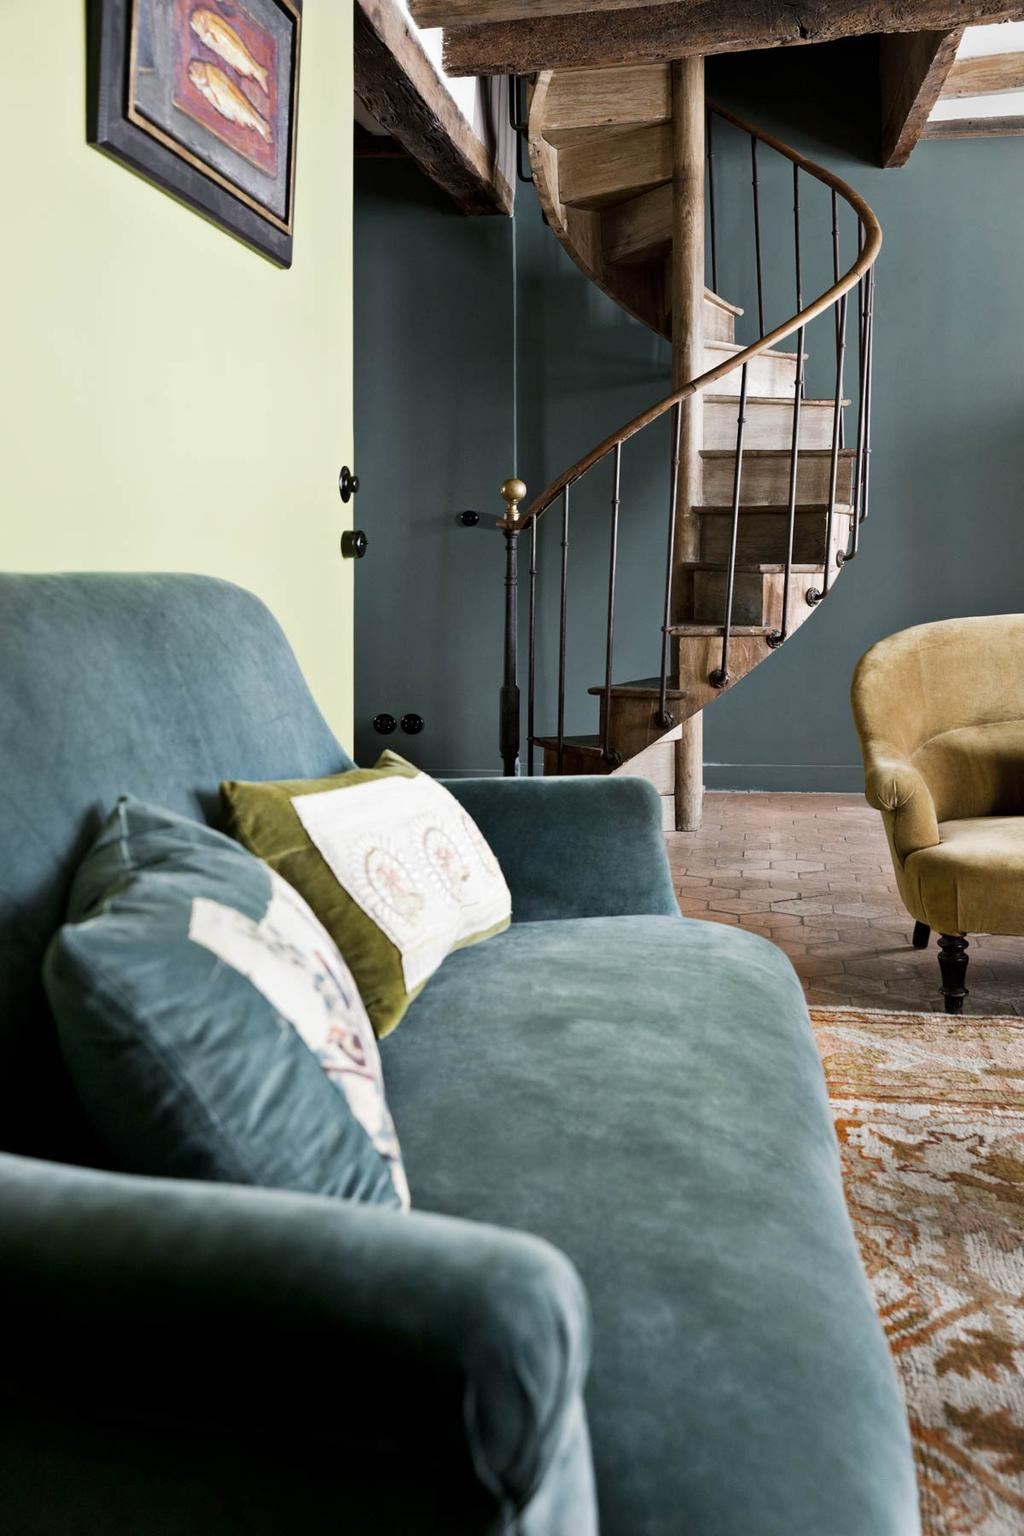 Houten ruimtebesparende trap in woonkamer met blauwe bank